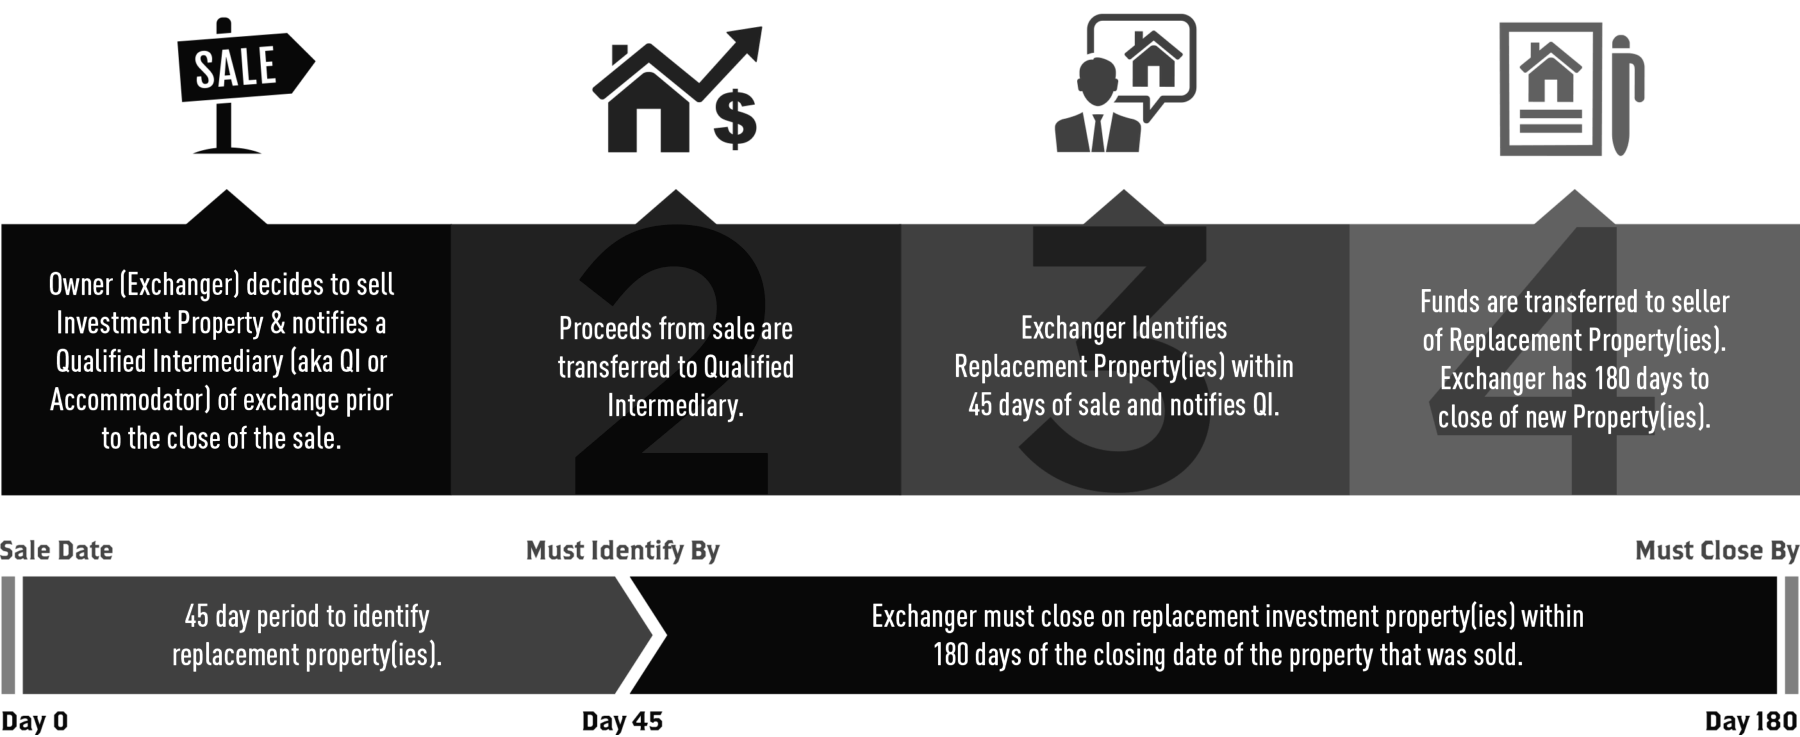 1031 Exchange Rules - 递延税汇兑